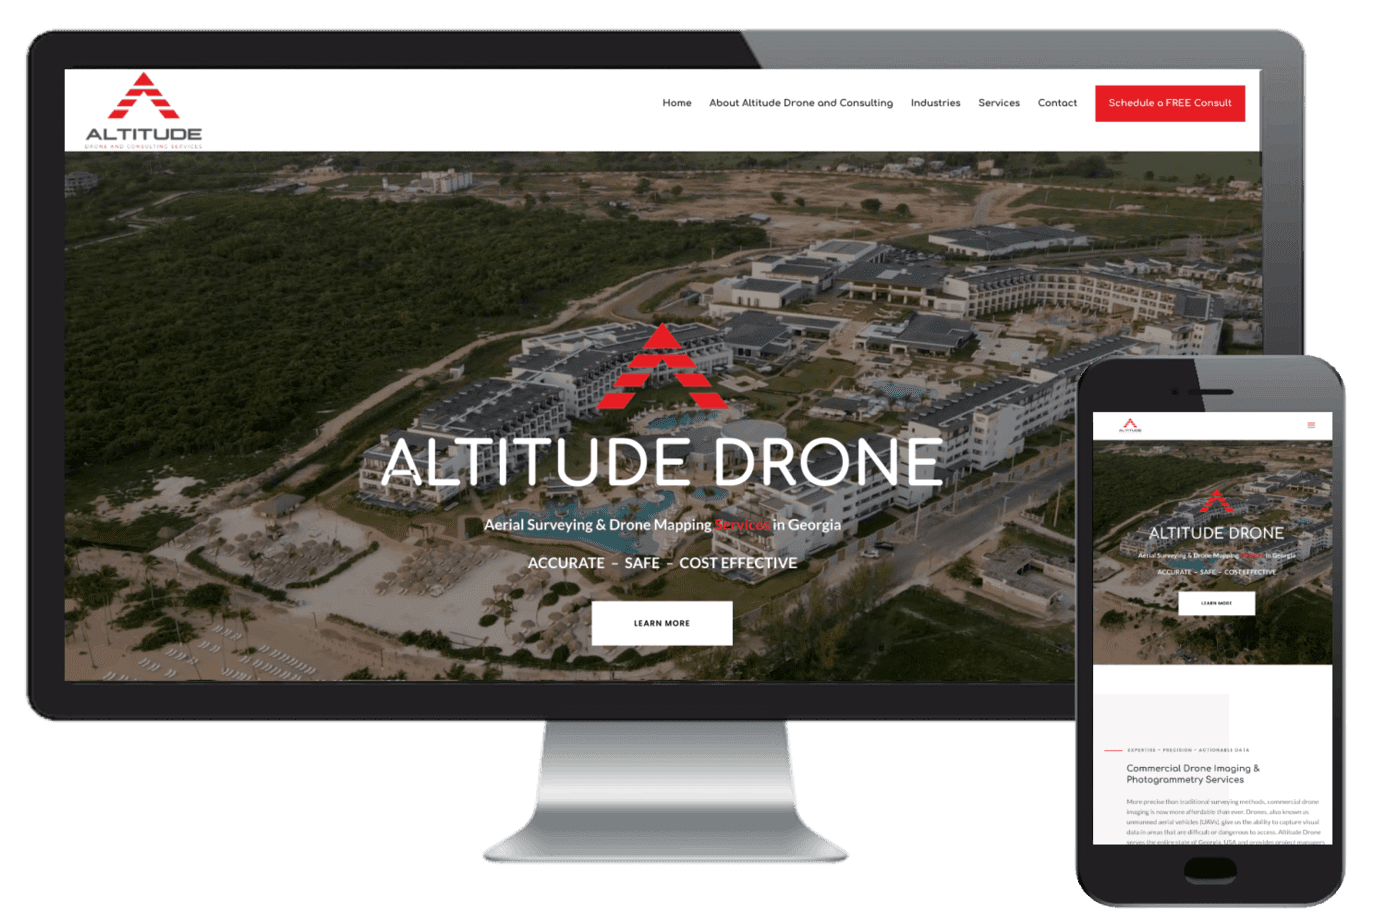 Altitude Drone Consulting Services